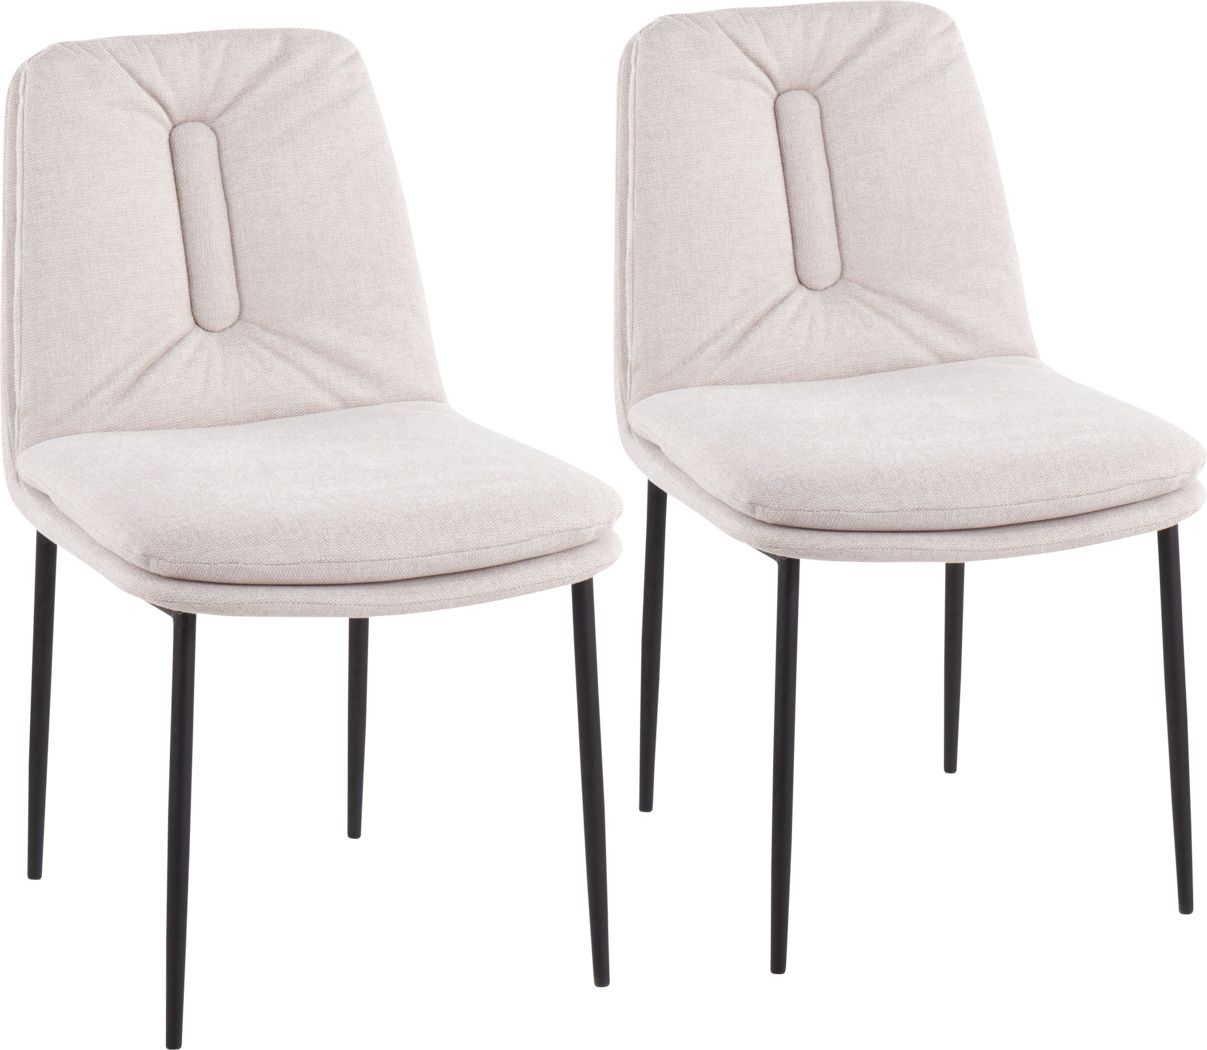 Kraemar Cream Side Chair, Set of 2